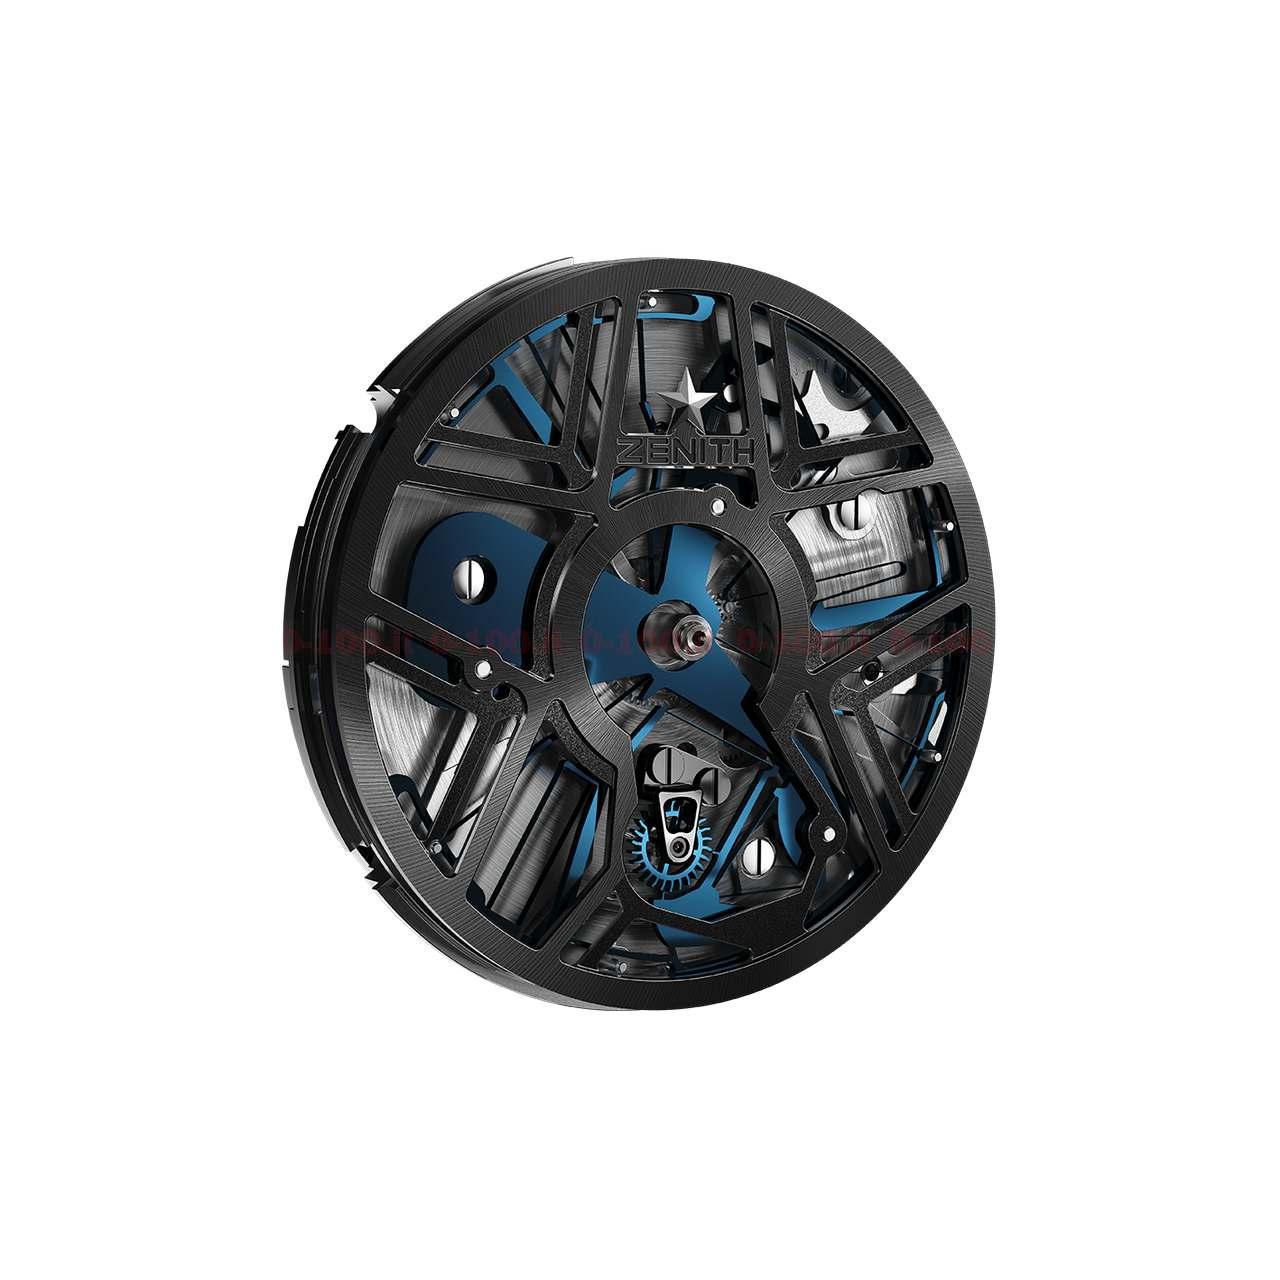 Zenith Defy Ref. 27.9000.342-78.R582_prezzo_price_0-10031